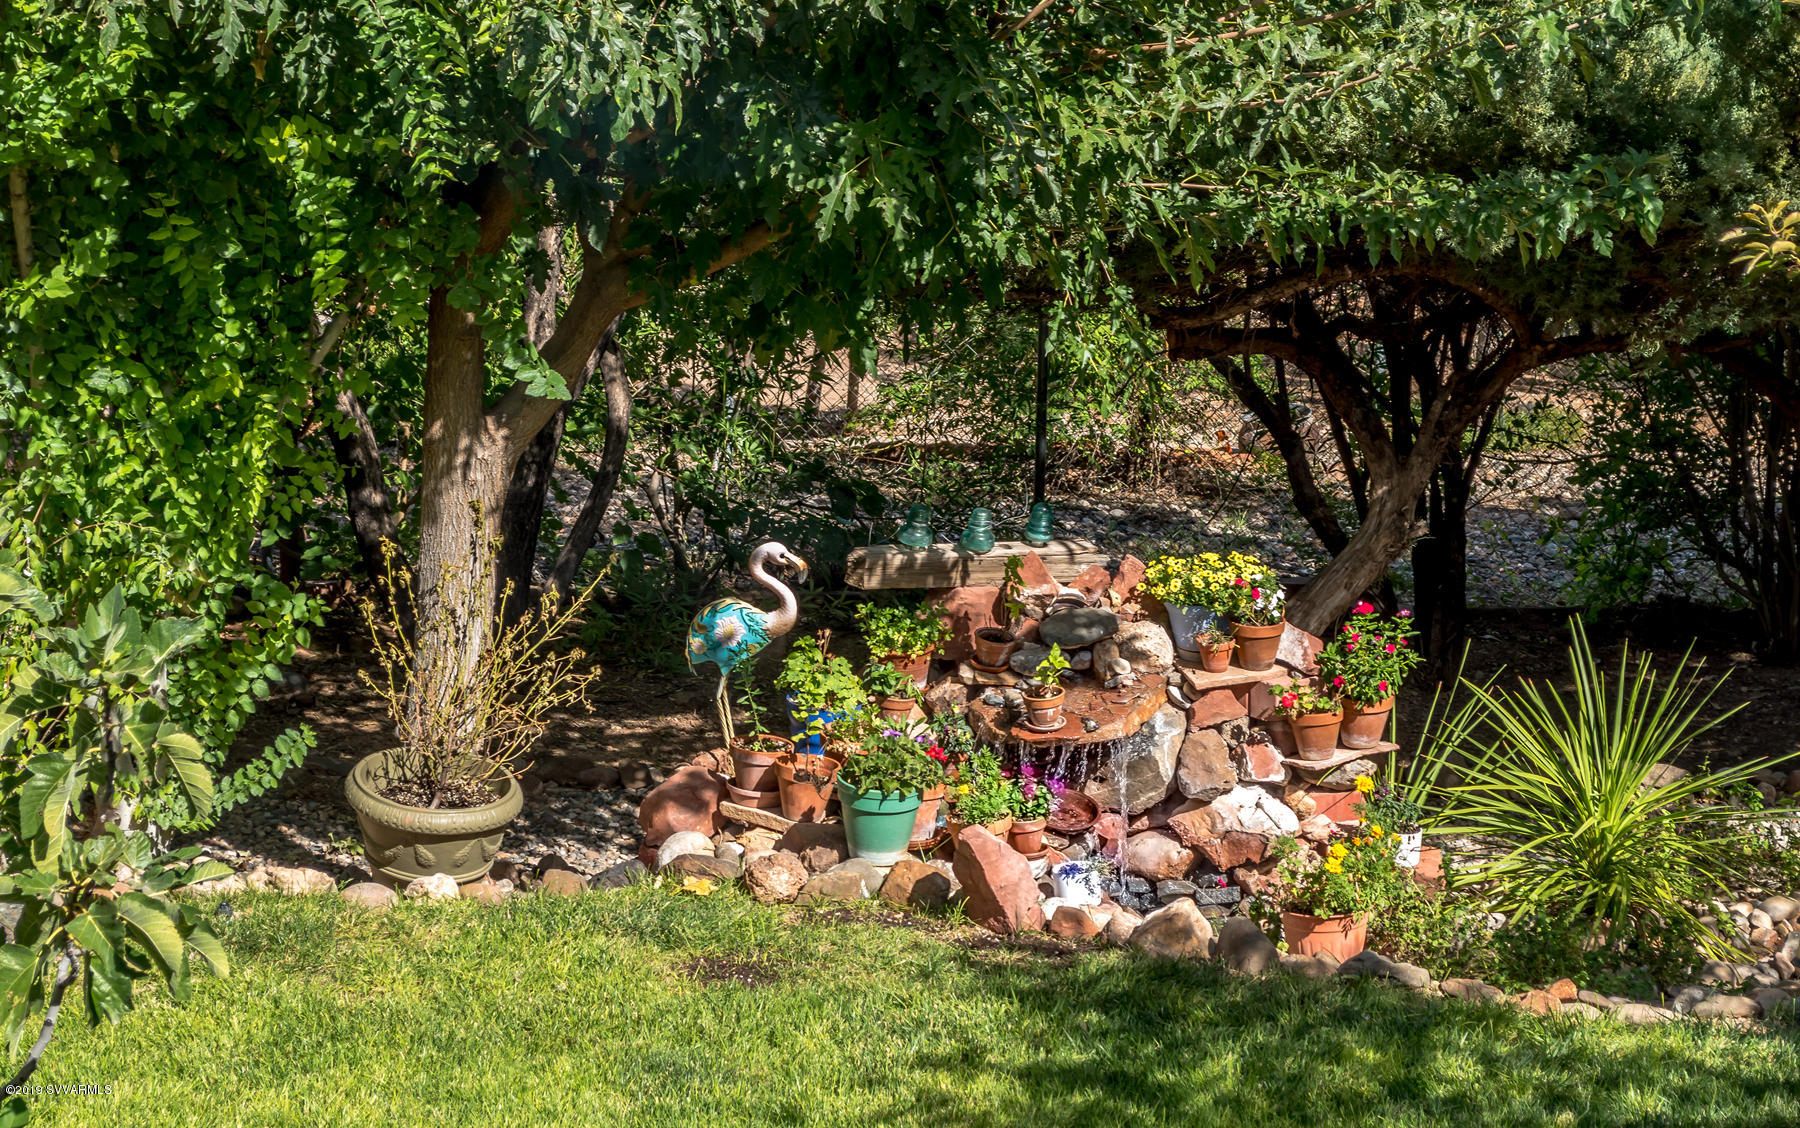 1840 E Donner Tr Cottonwood, AZ 86326